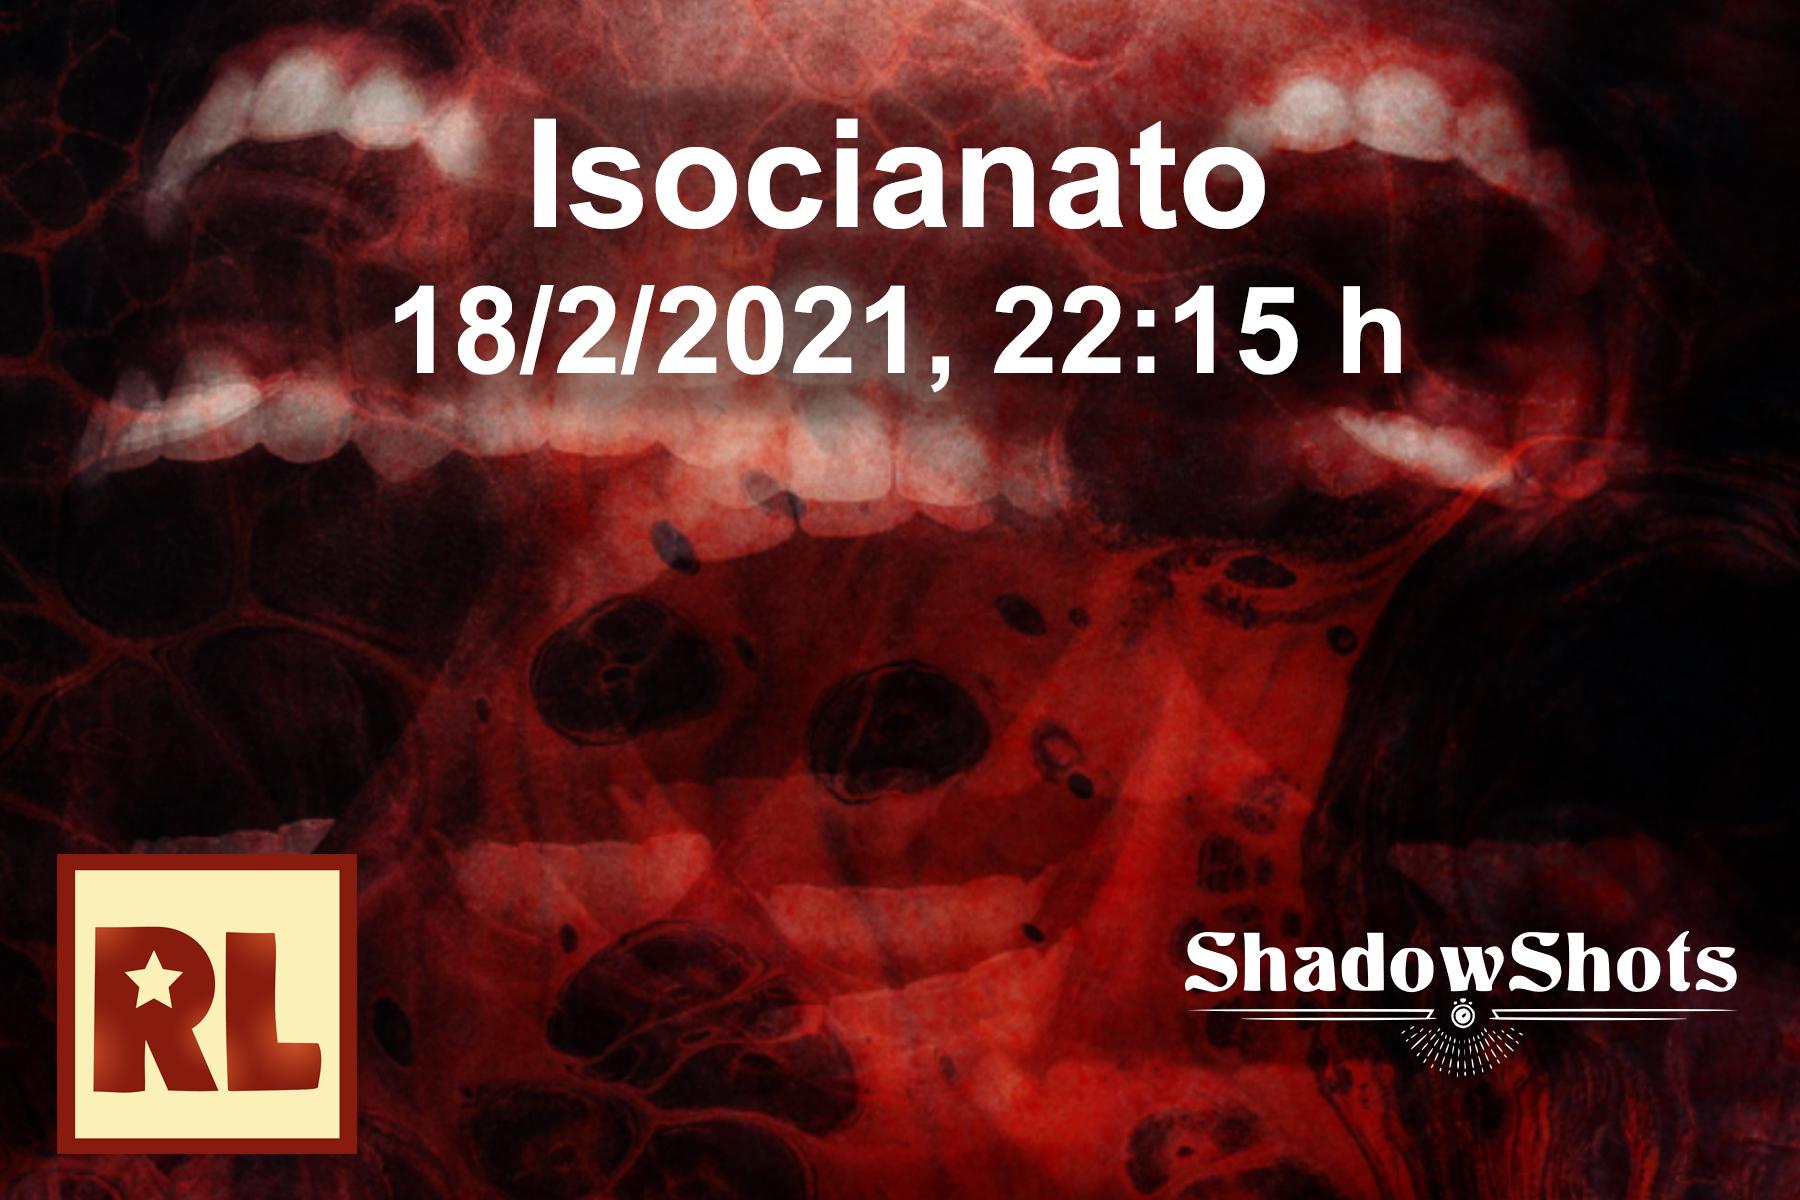 Resistencia Lúdica Isocianato (Shadowshot)